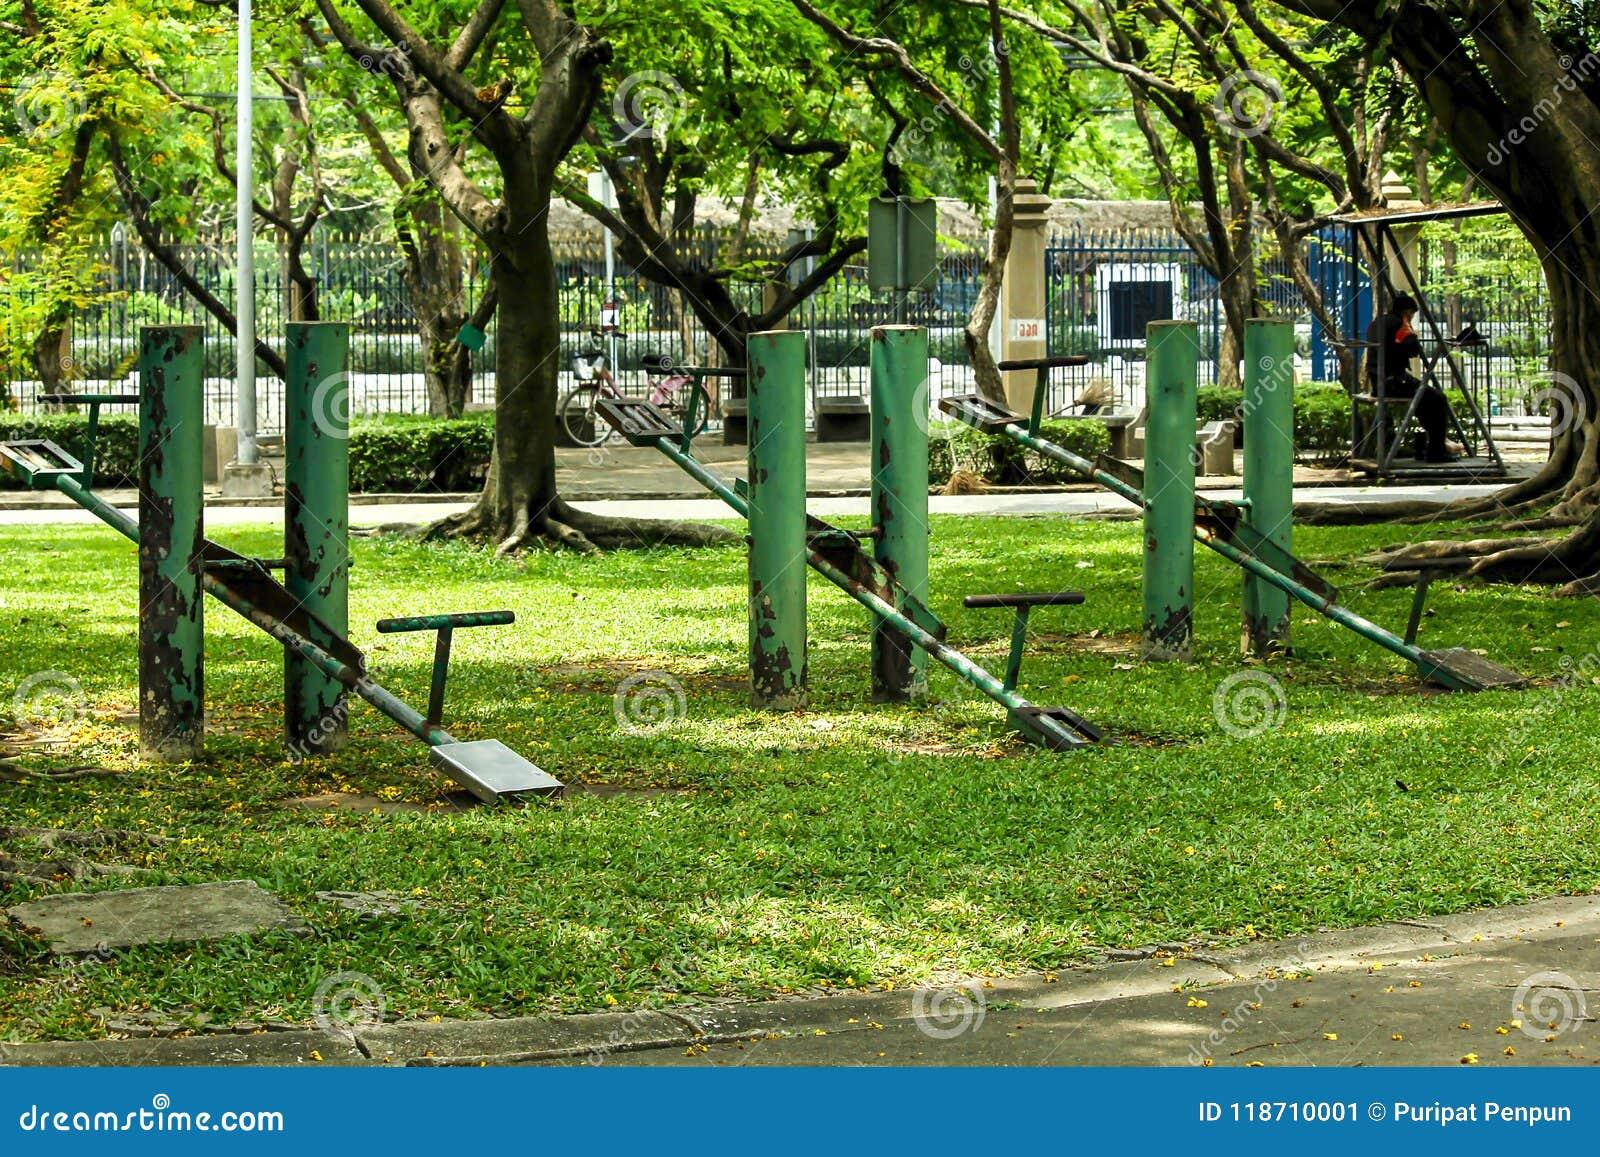 Stary Zielony Seesaw parka adres